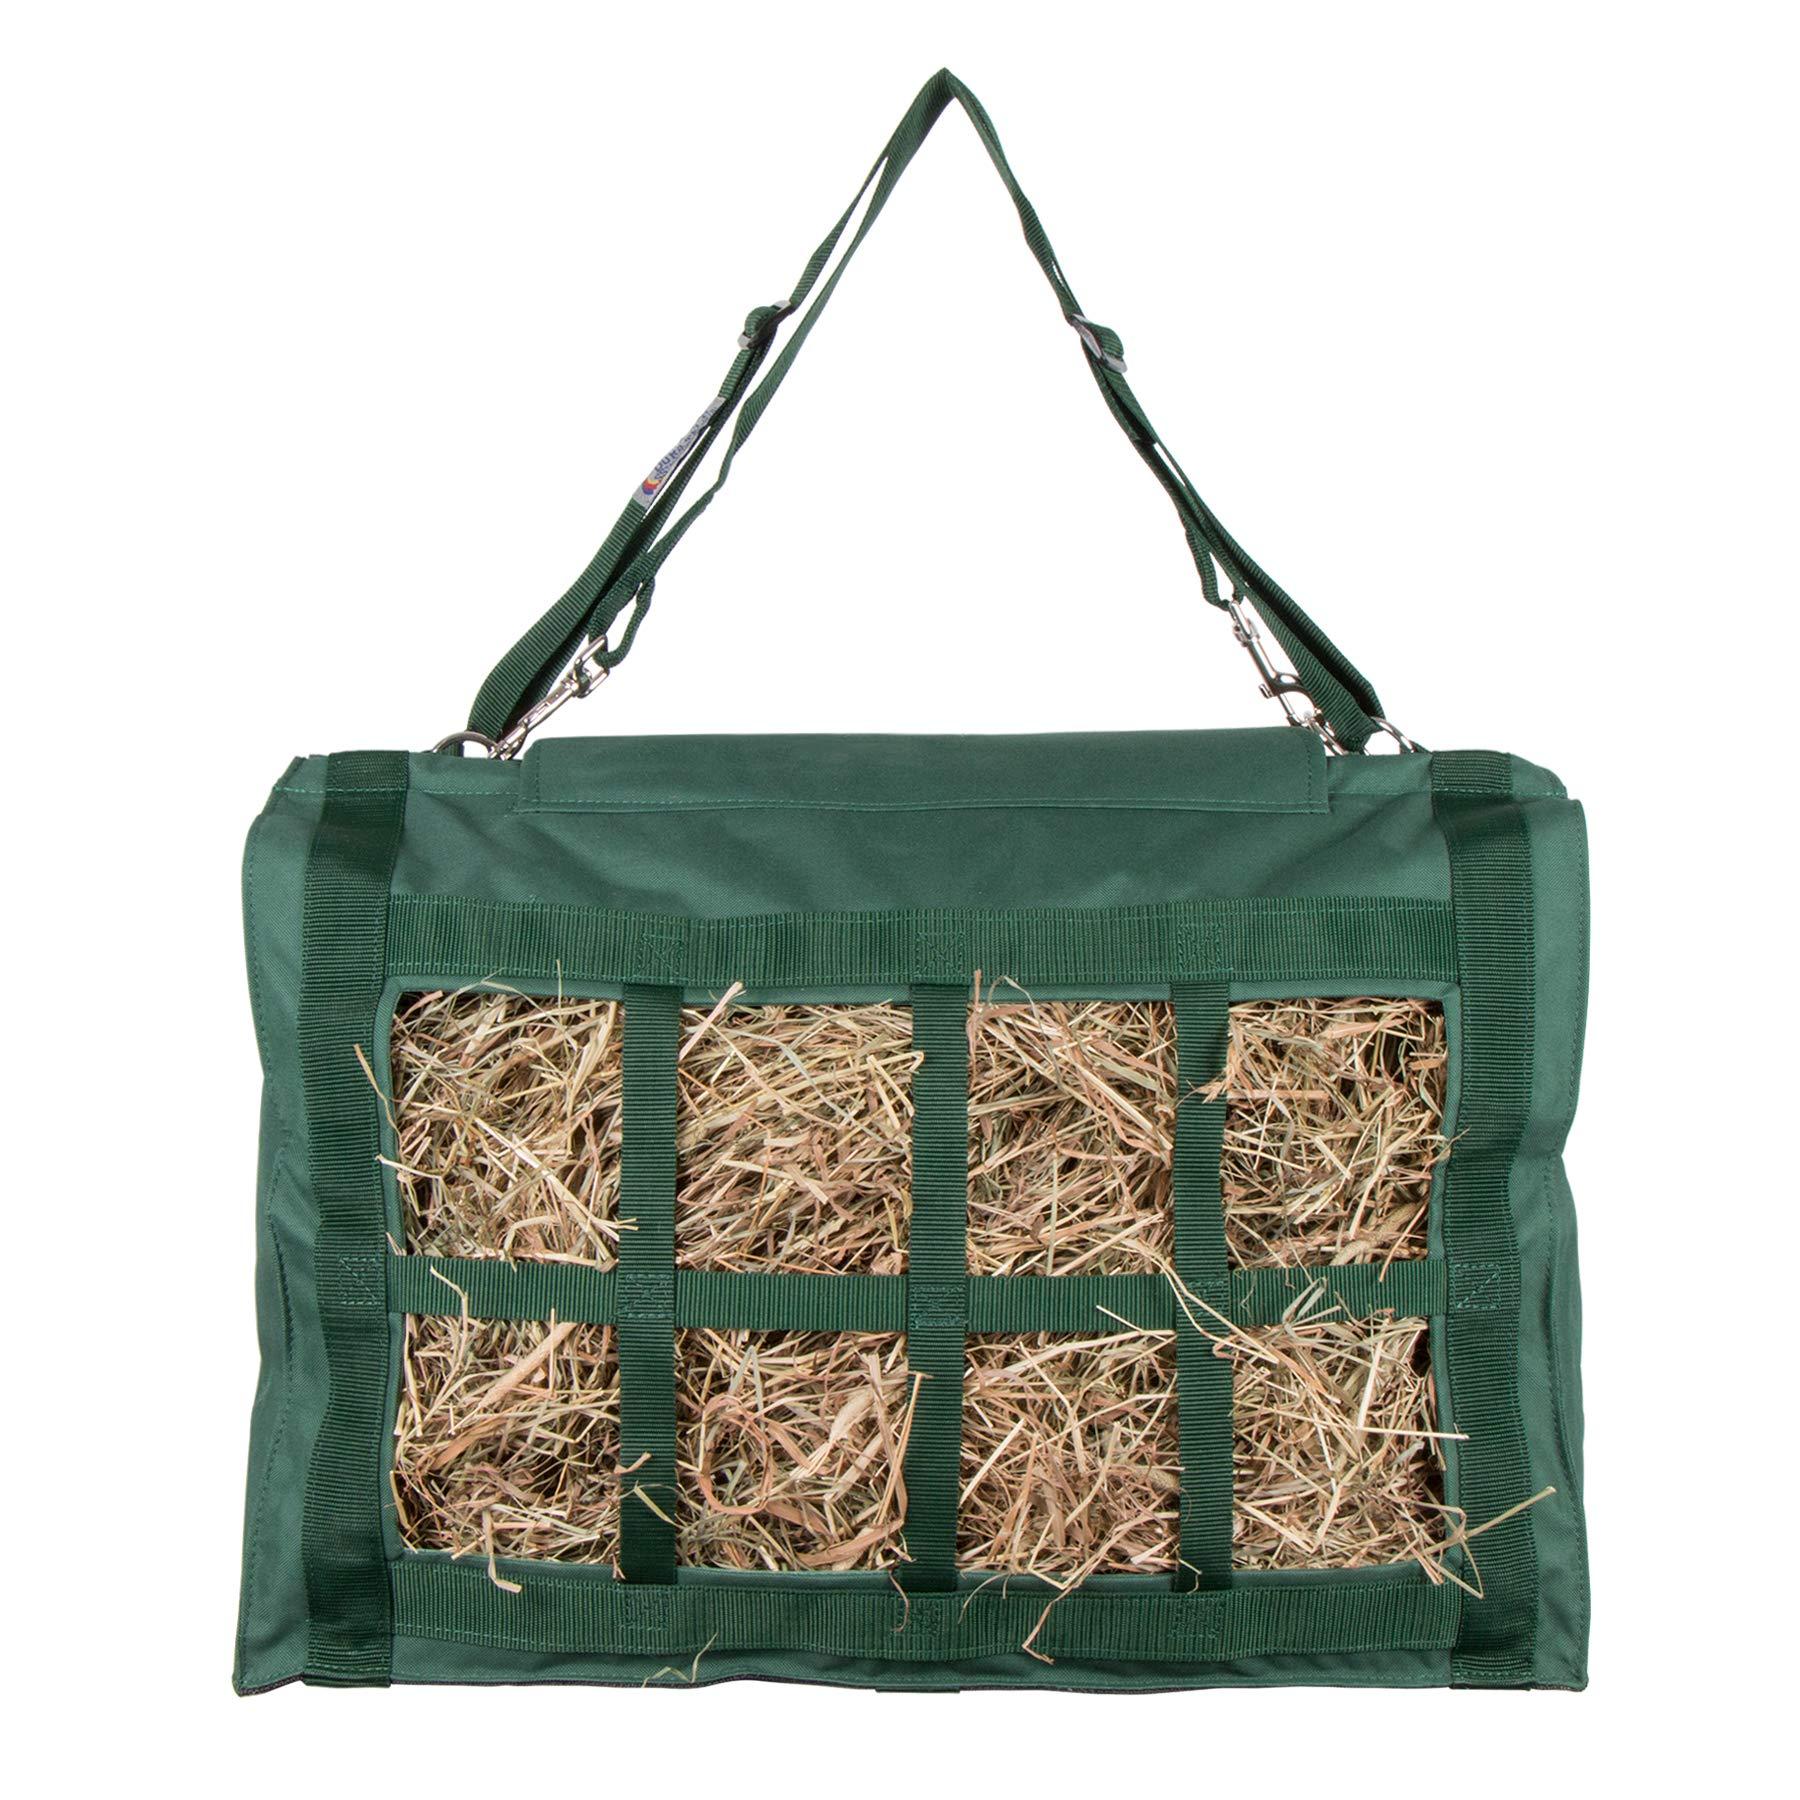 Dura-Tech XL Reinforced Top Hay Saver Bag (Green)